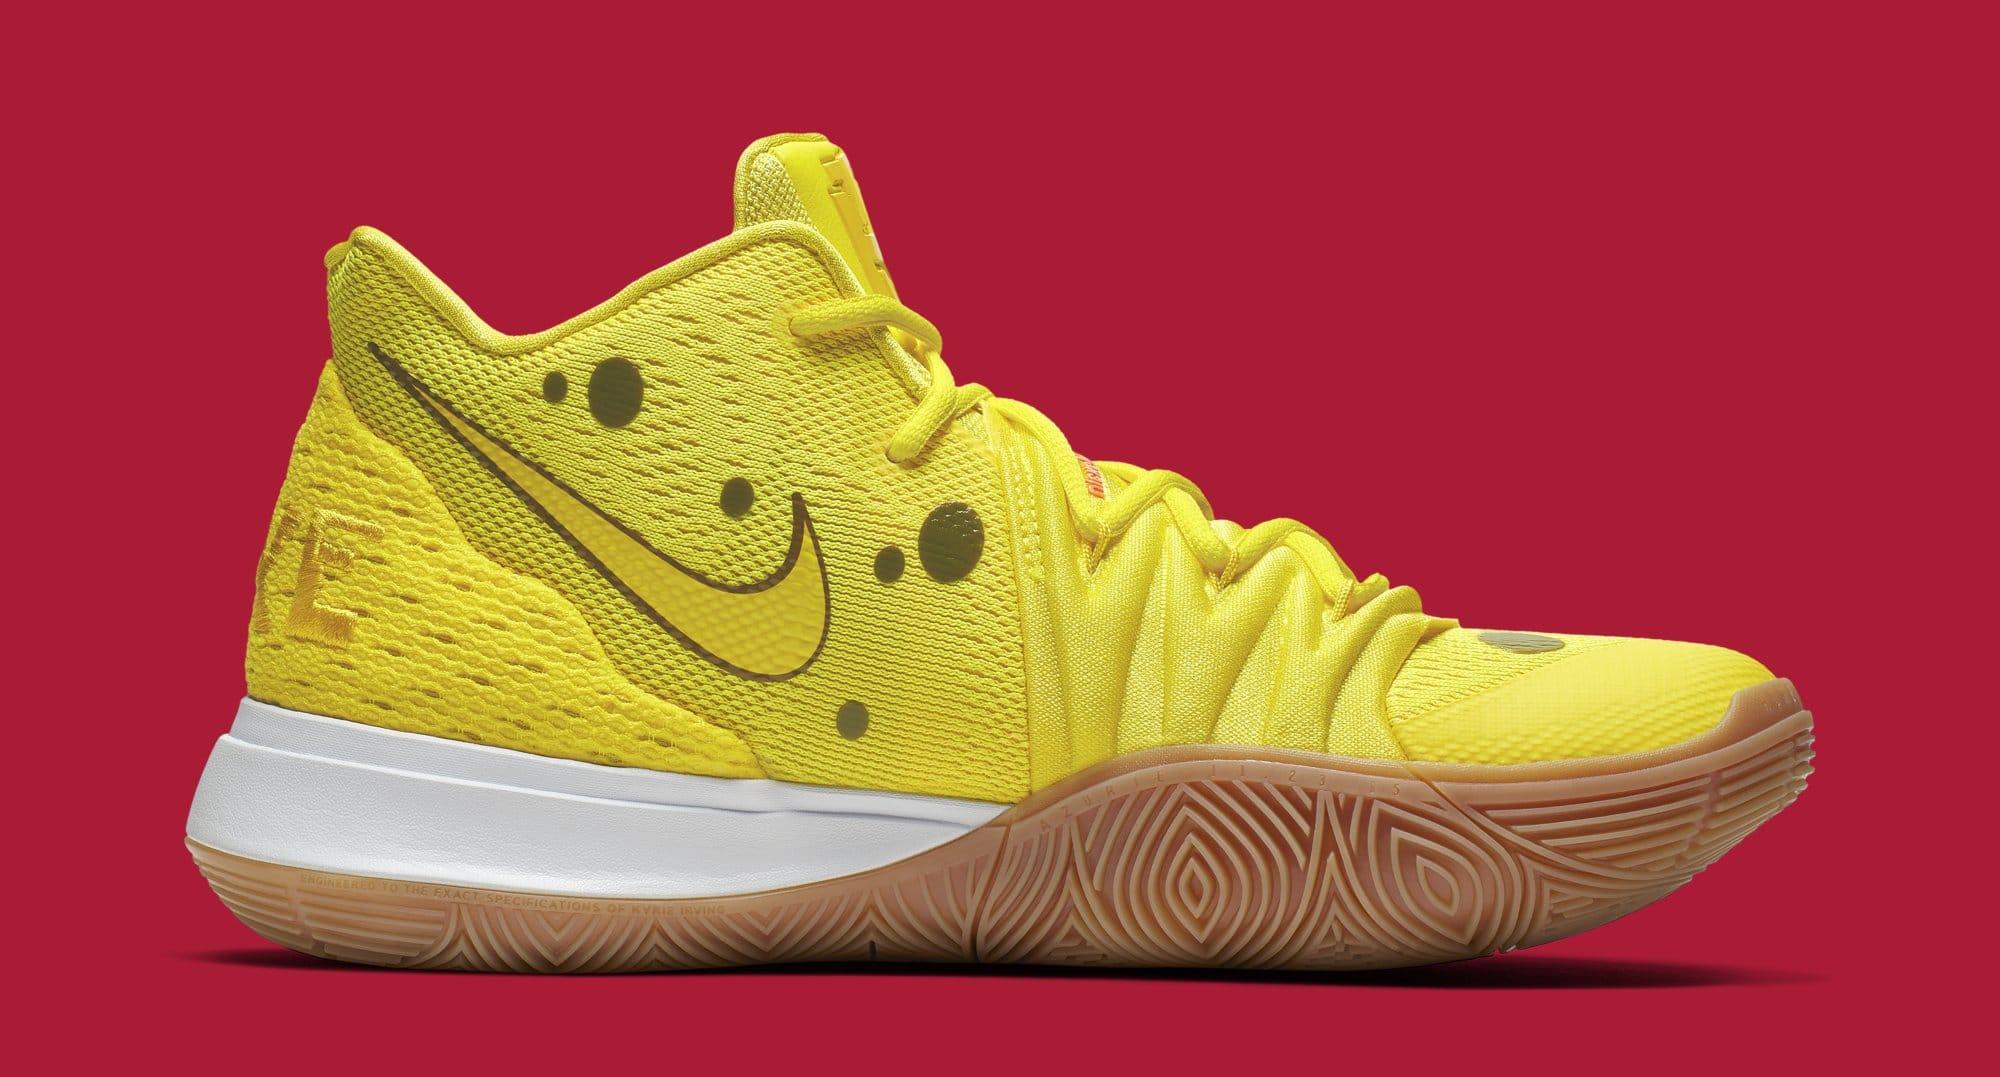 'SpongeBob SquarePants' x Nike Kyrie 5 'SpongeBob' CJ6951-700 (Medial)